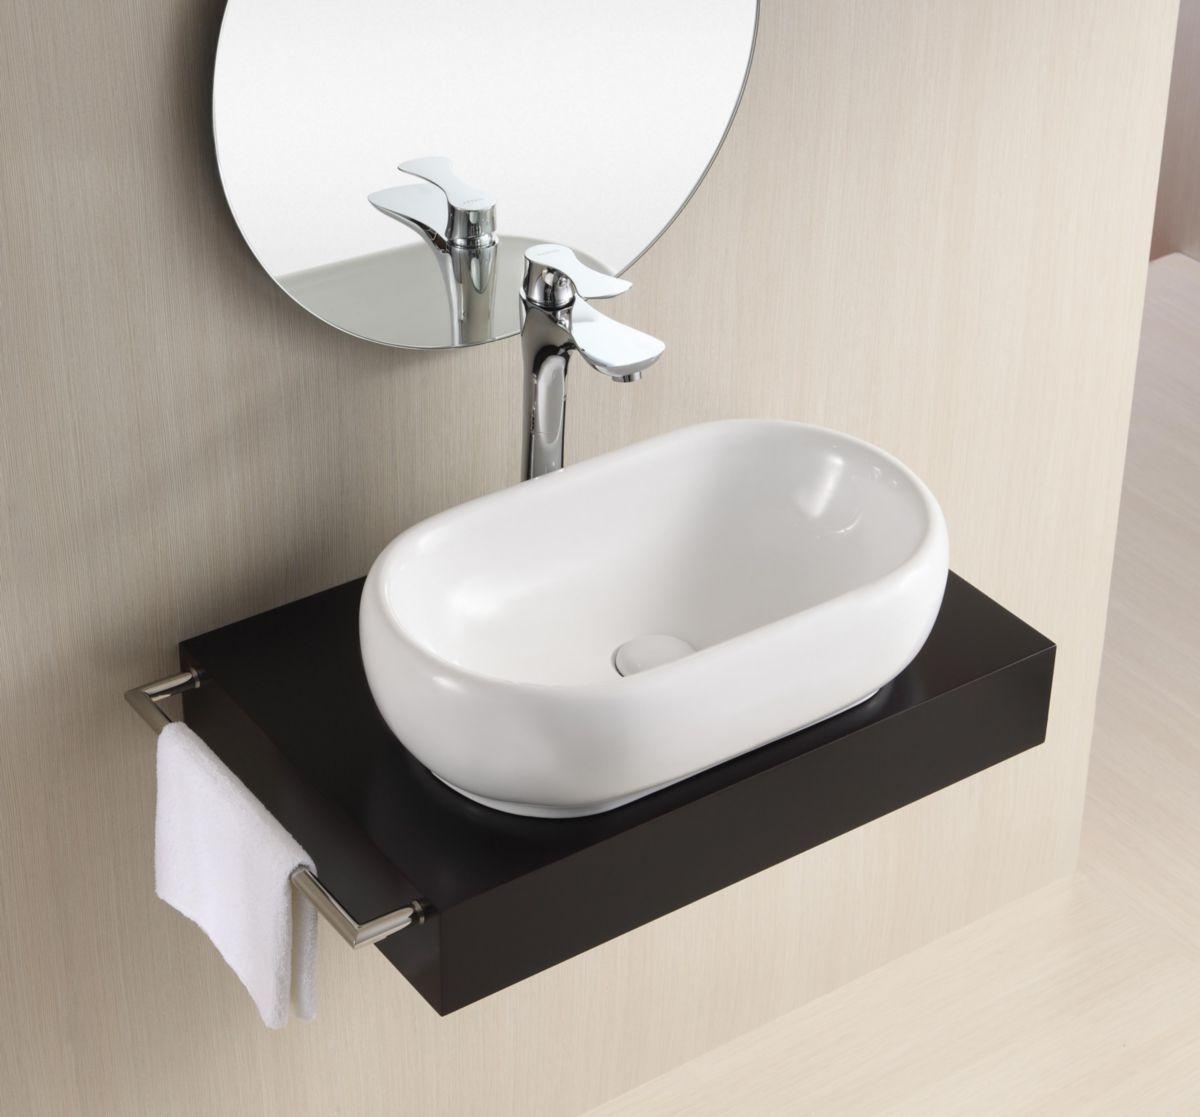 Exceptionnel Vasque Ovale A Poser #15: Vasque à Poser Plenitude Ovale 50x30,5 Cm - ALTERNA - Sanitaire -CEDEO